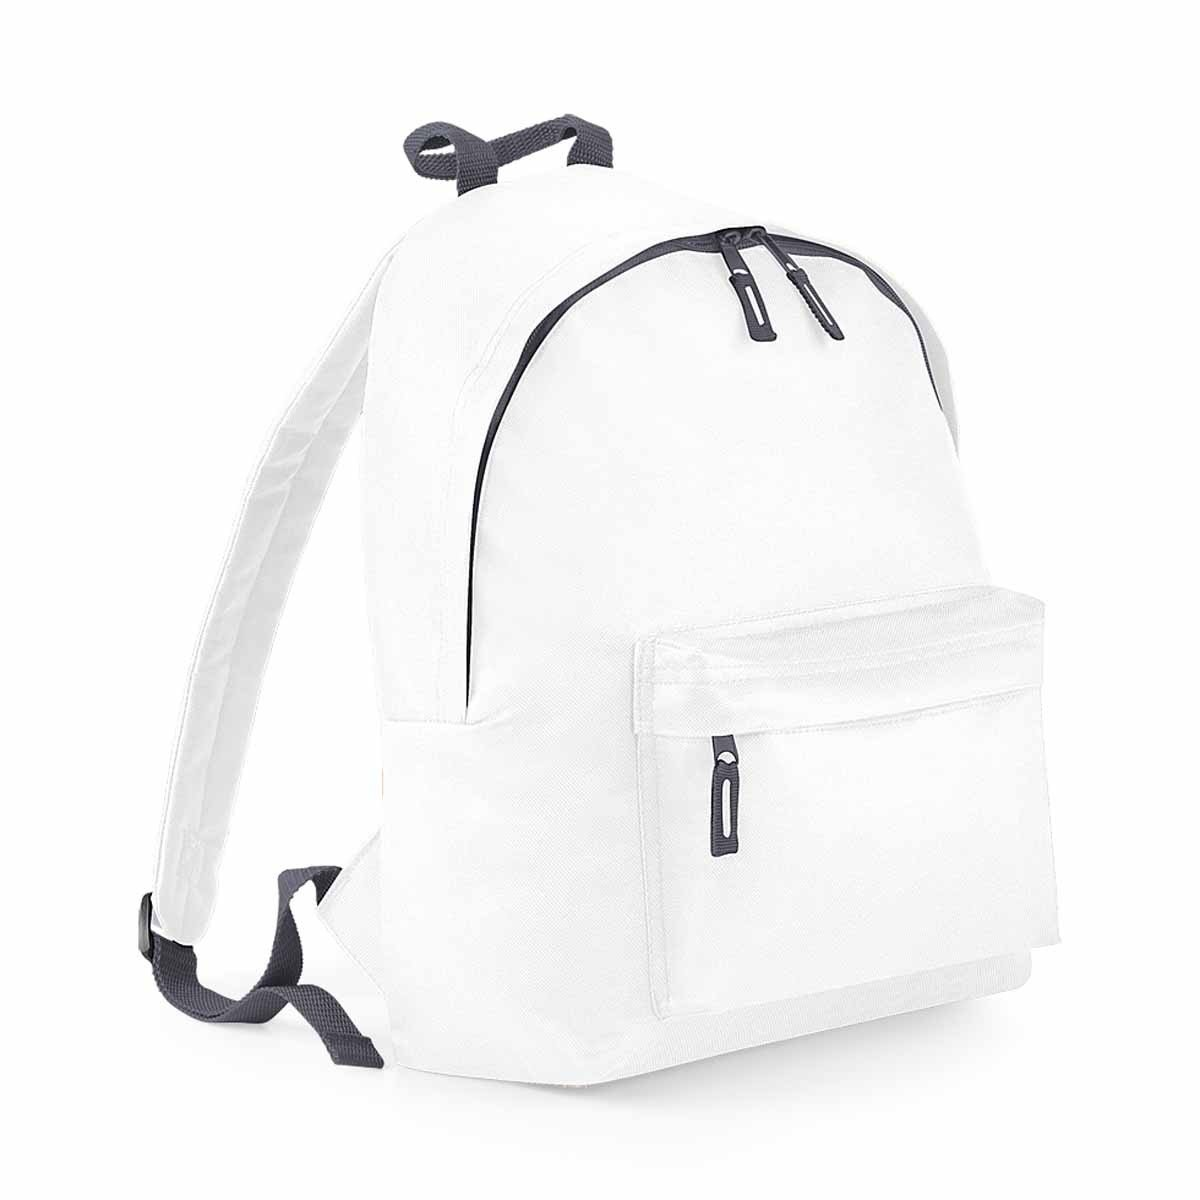 BagBase Unisex s B125JWHGP Junior Fashion Backpack White Graphite Grey  B125j 45af0bee9d0ec